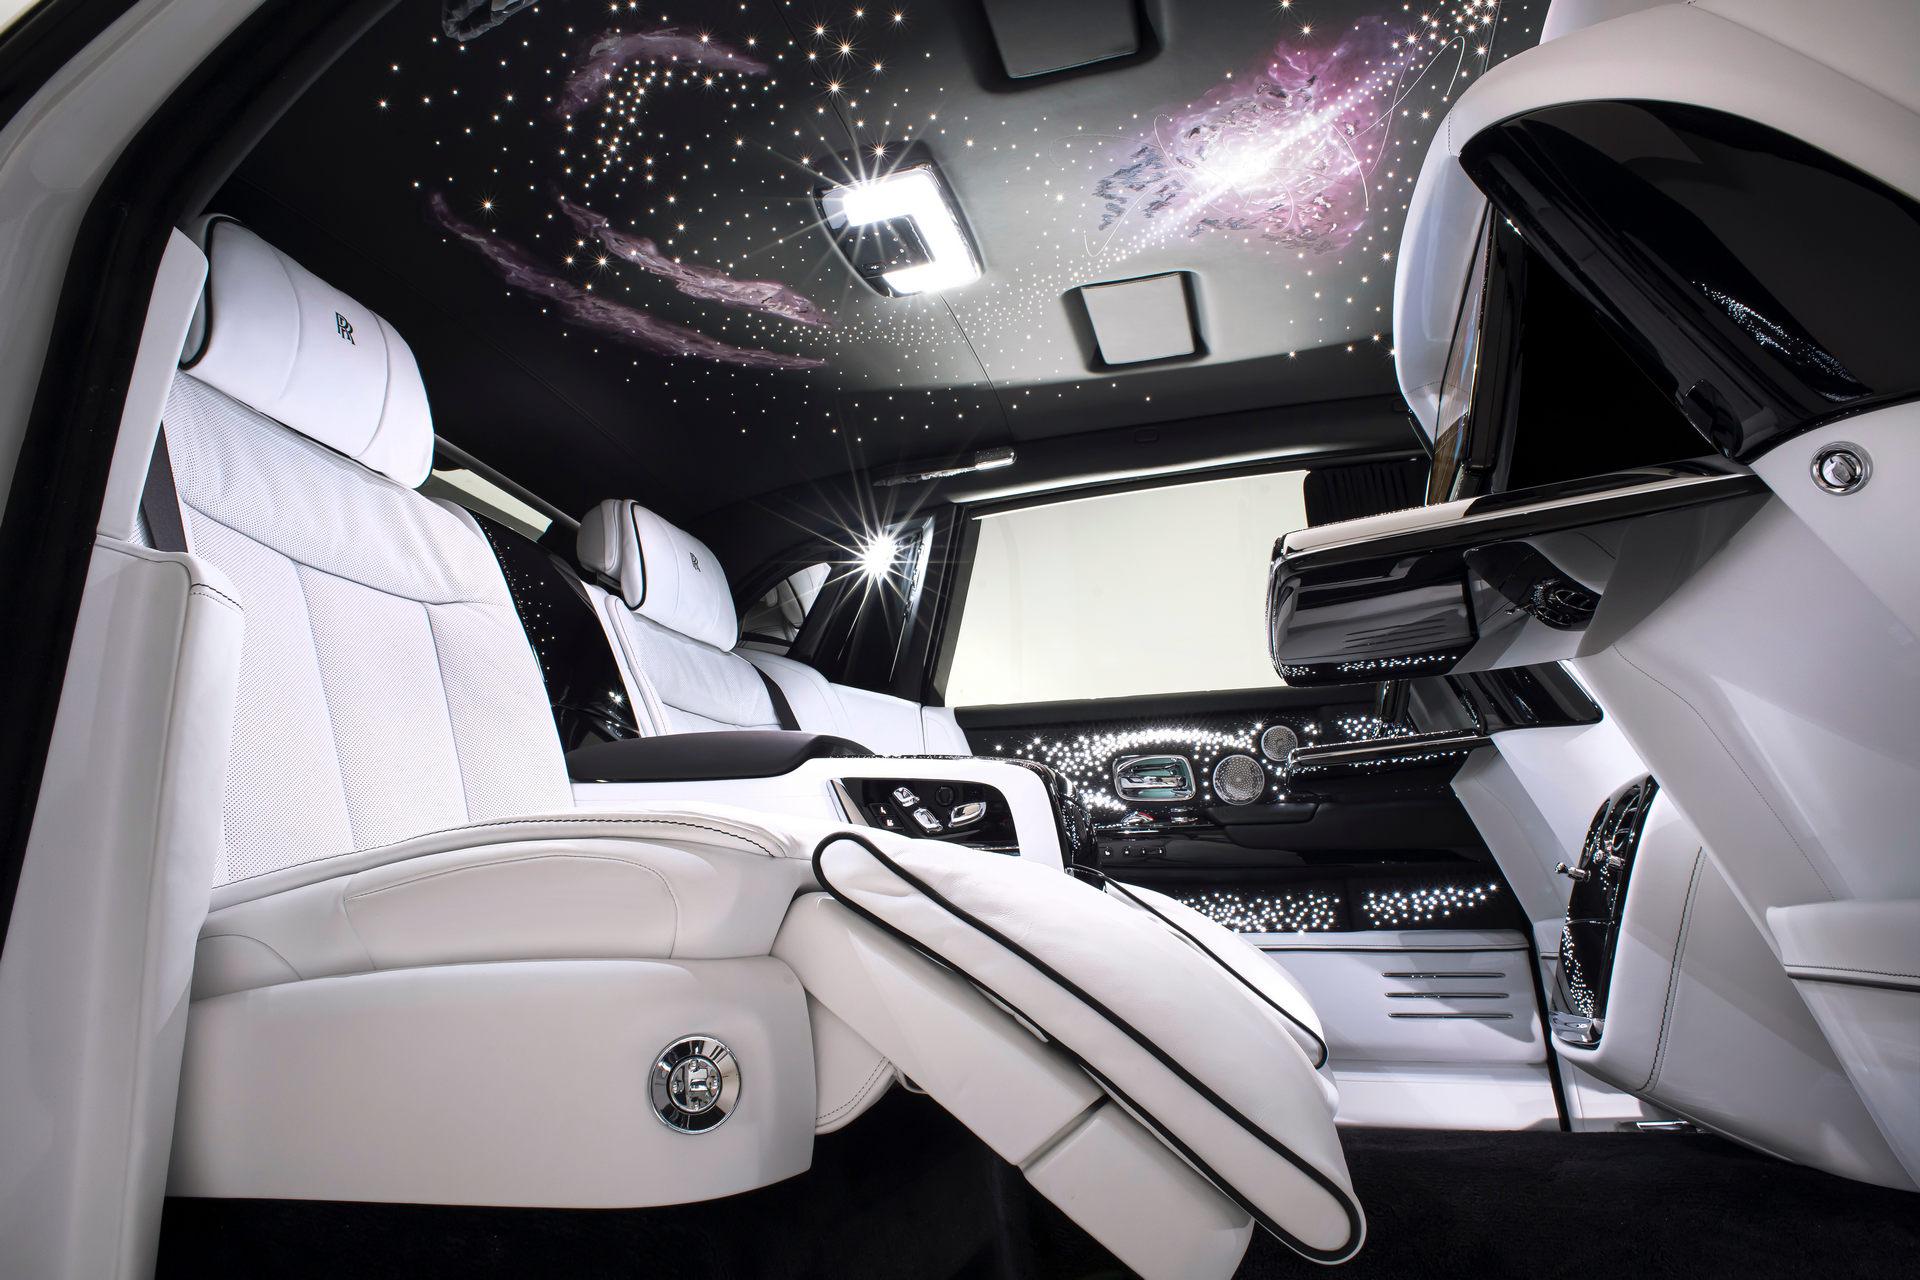 Bespoke-Rolls-Royce-Phantom-and-Dawn-11